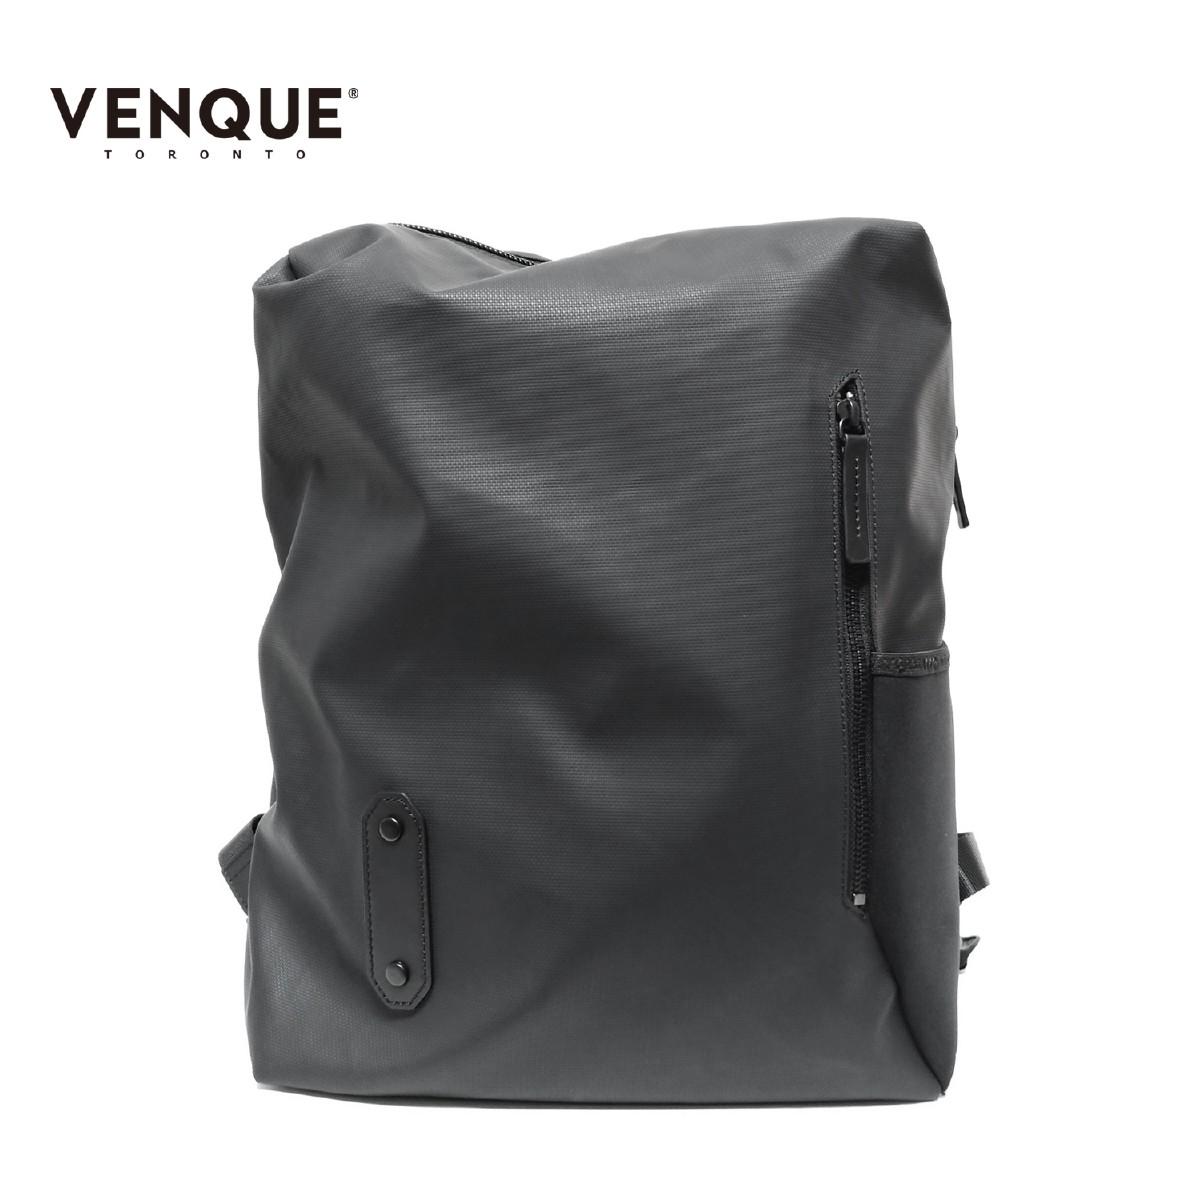 VENQUE ヴェンク THE BOX Hyberlight バックパック メンズ/レディース ブラック OS